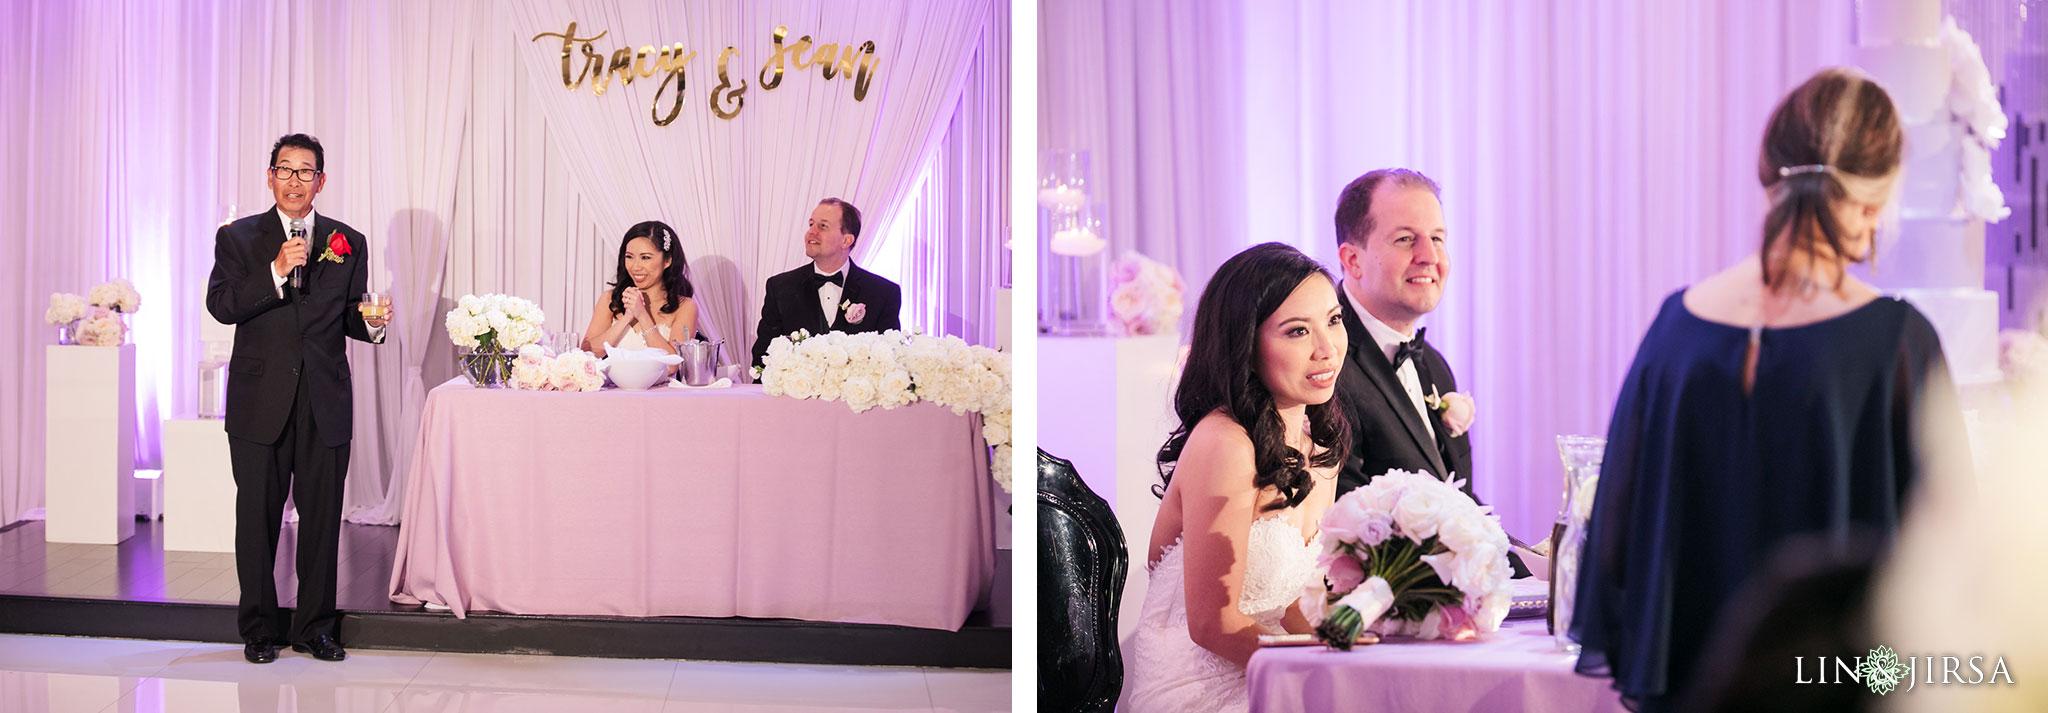 38 vertigo banquet hall glendale wedding photography